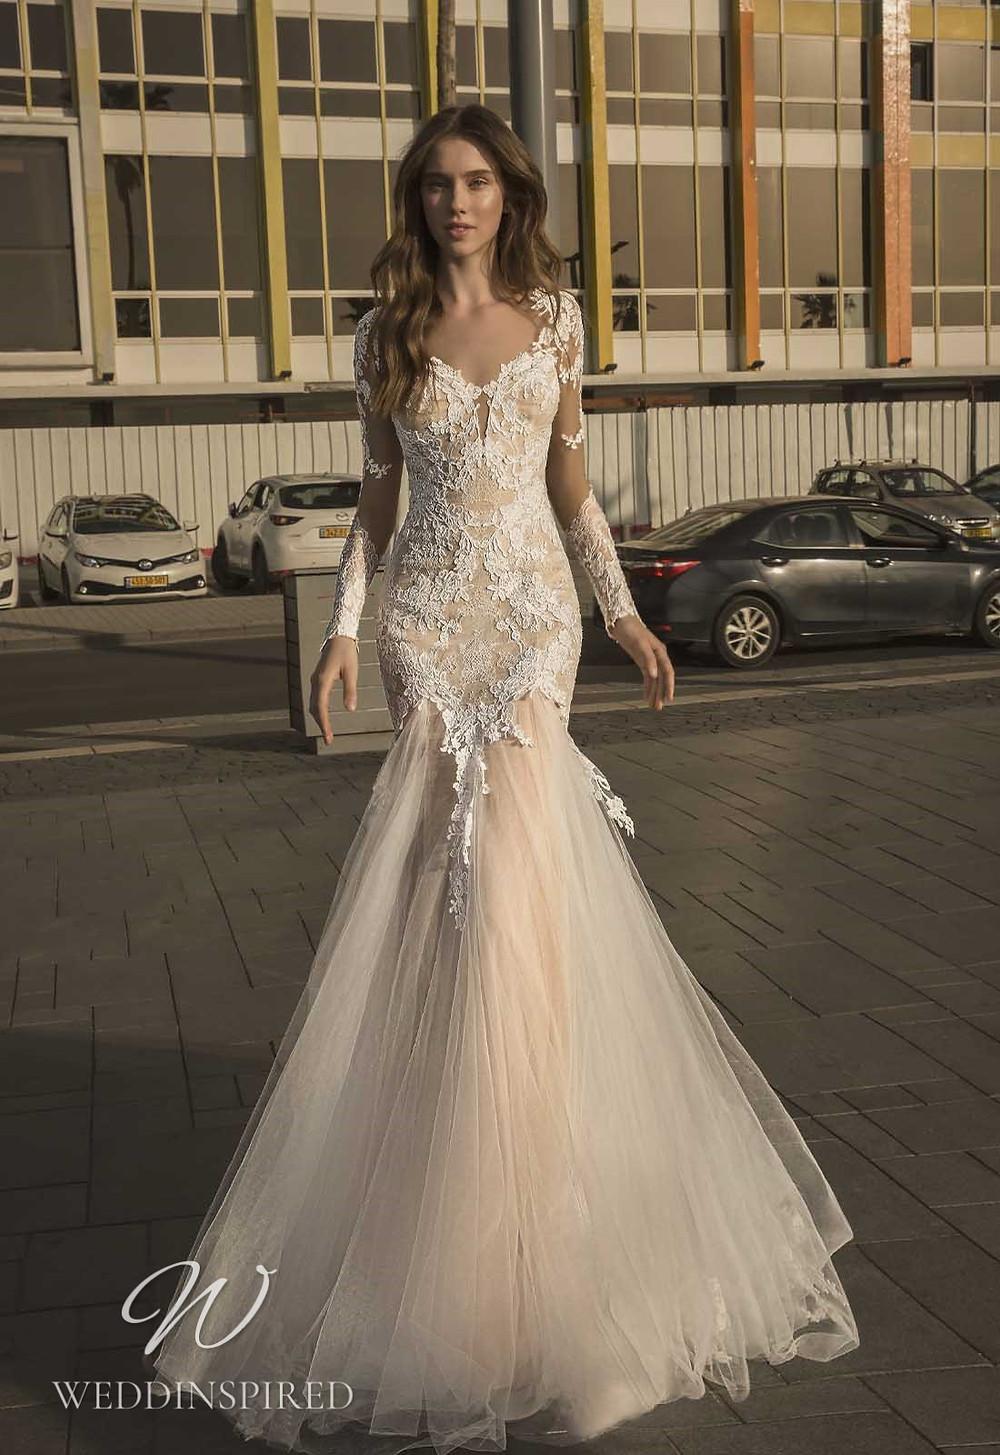 A Pnina Tornai 2021 lace mermaid wedding dress with long sleeves